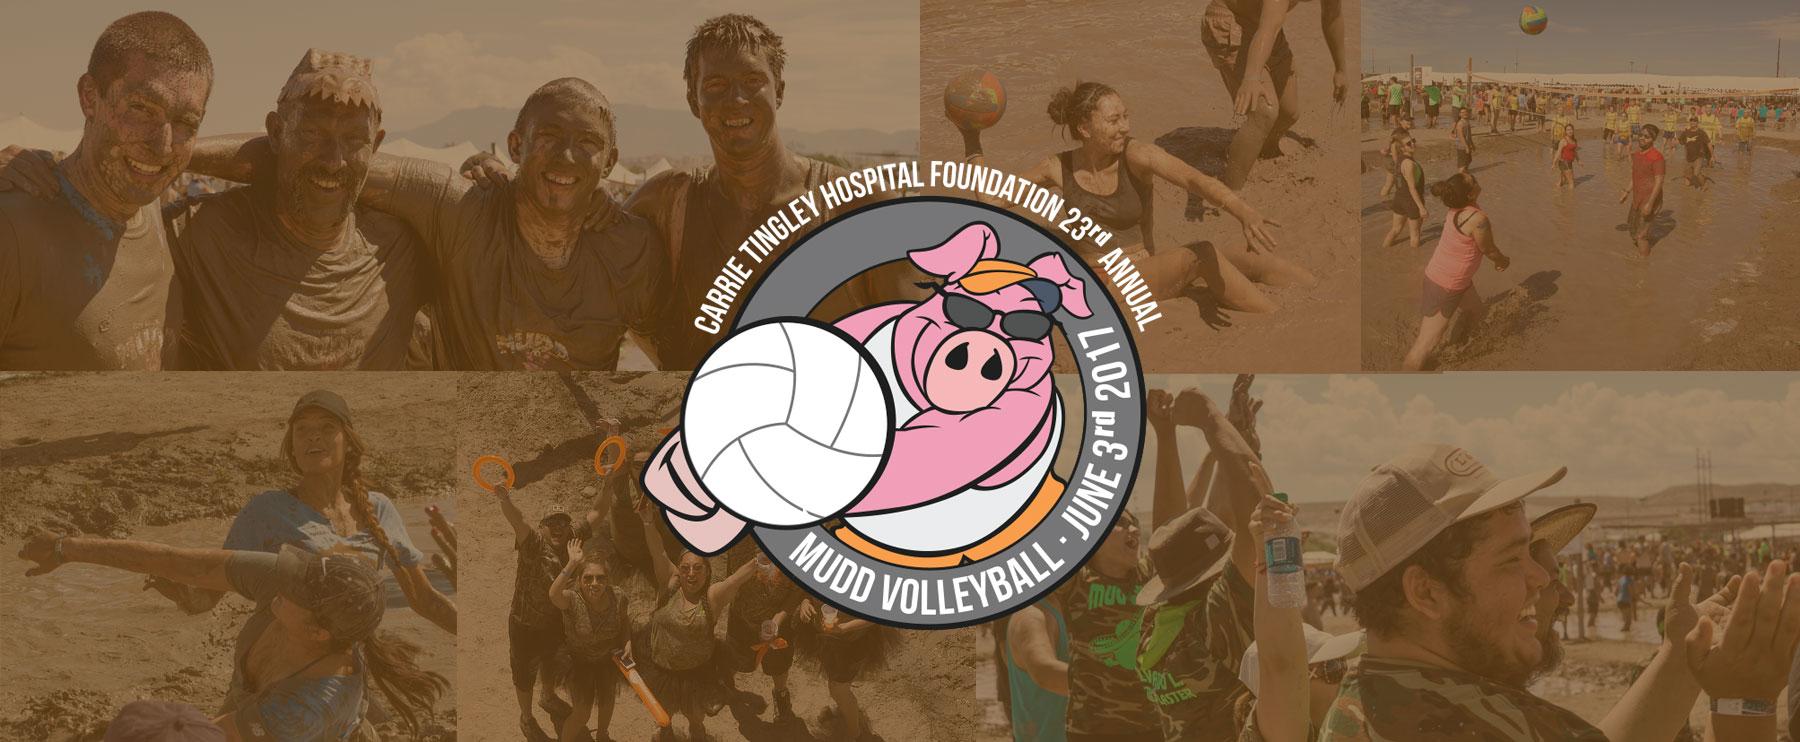 2017 albuquerque mudd volleyball for Craft shows in albuquerque 2017